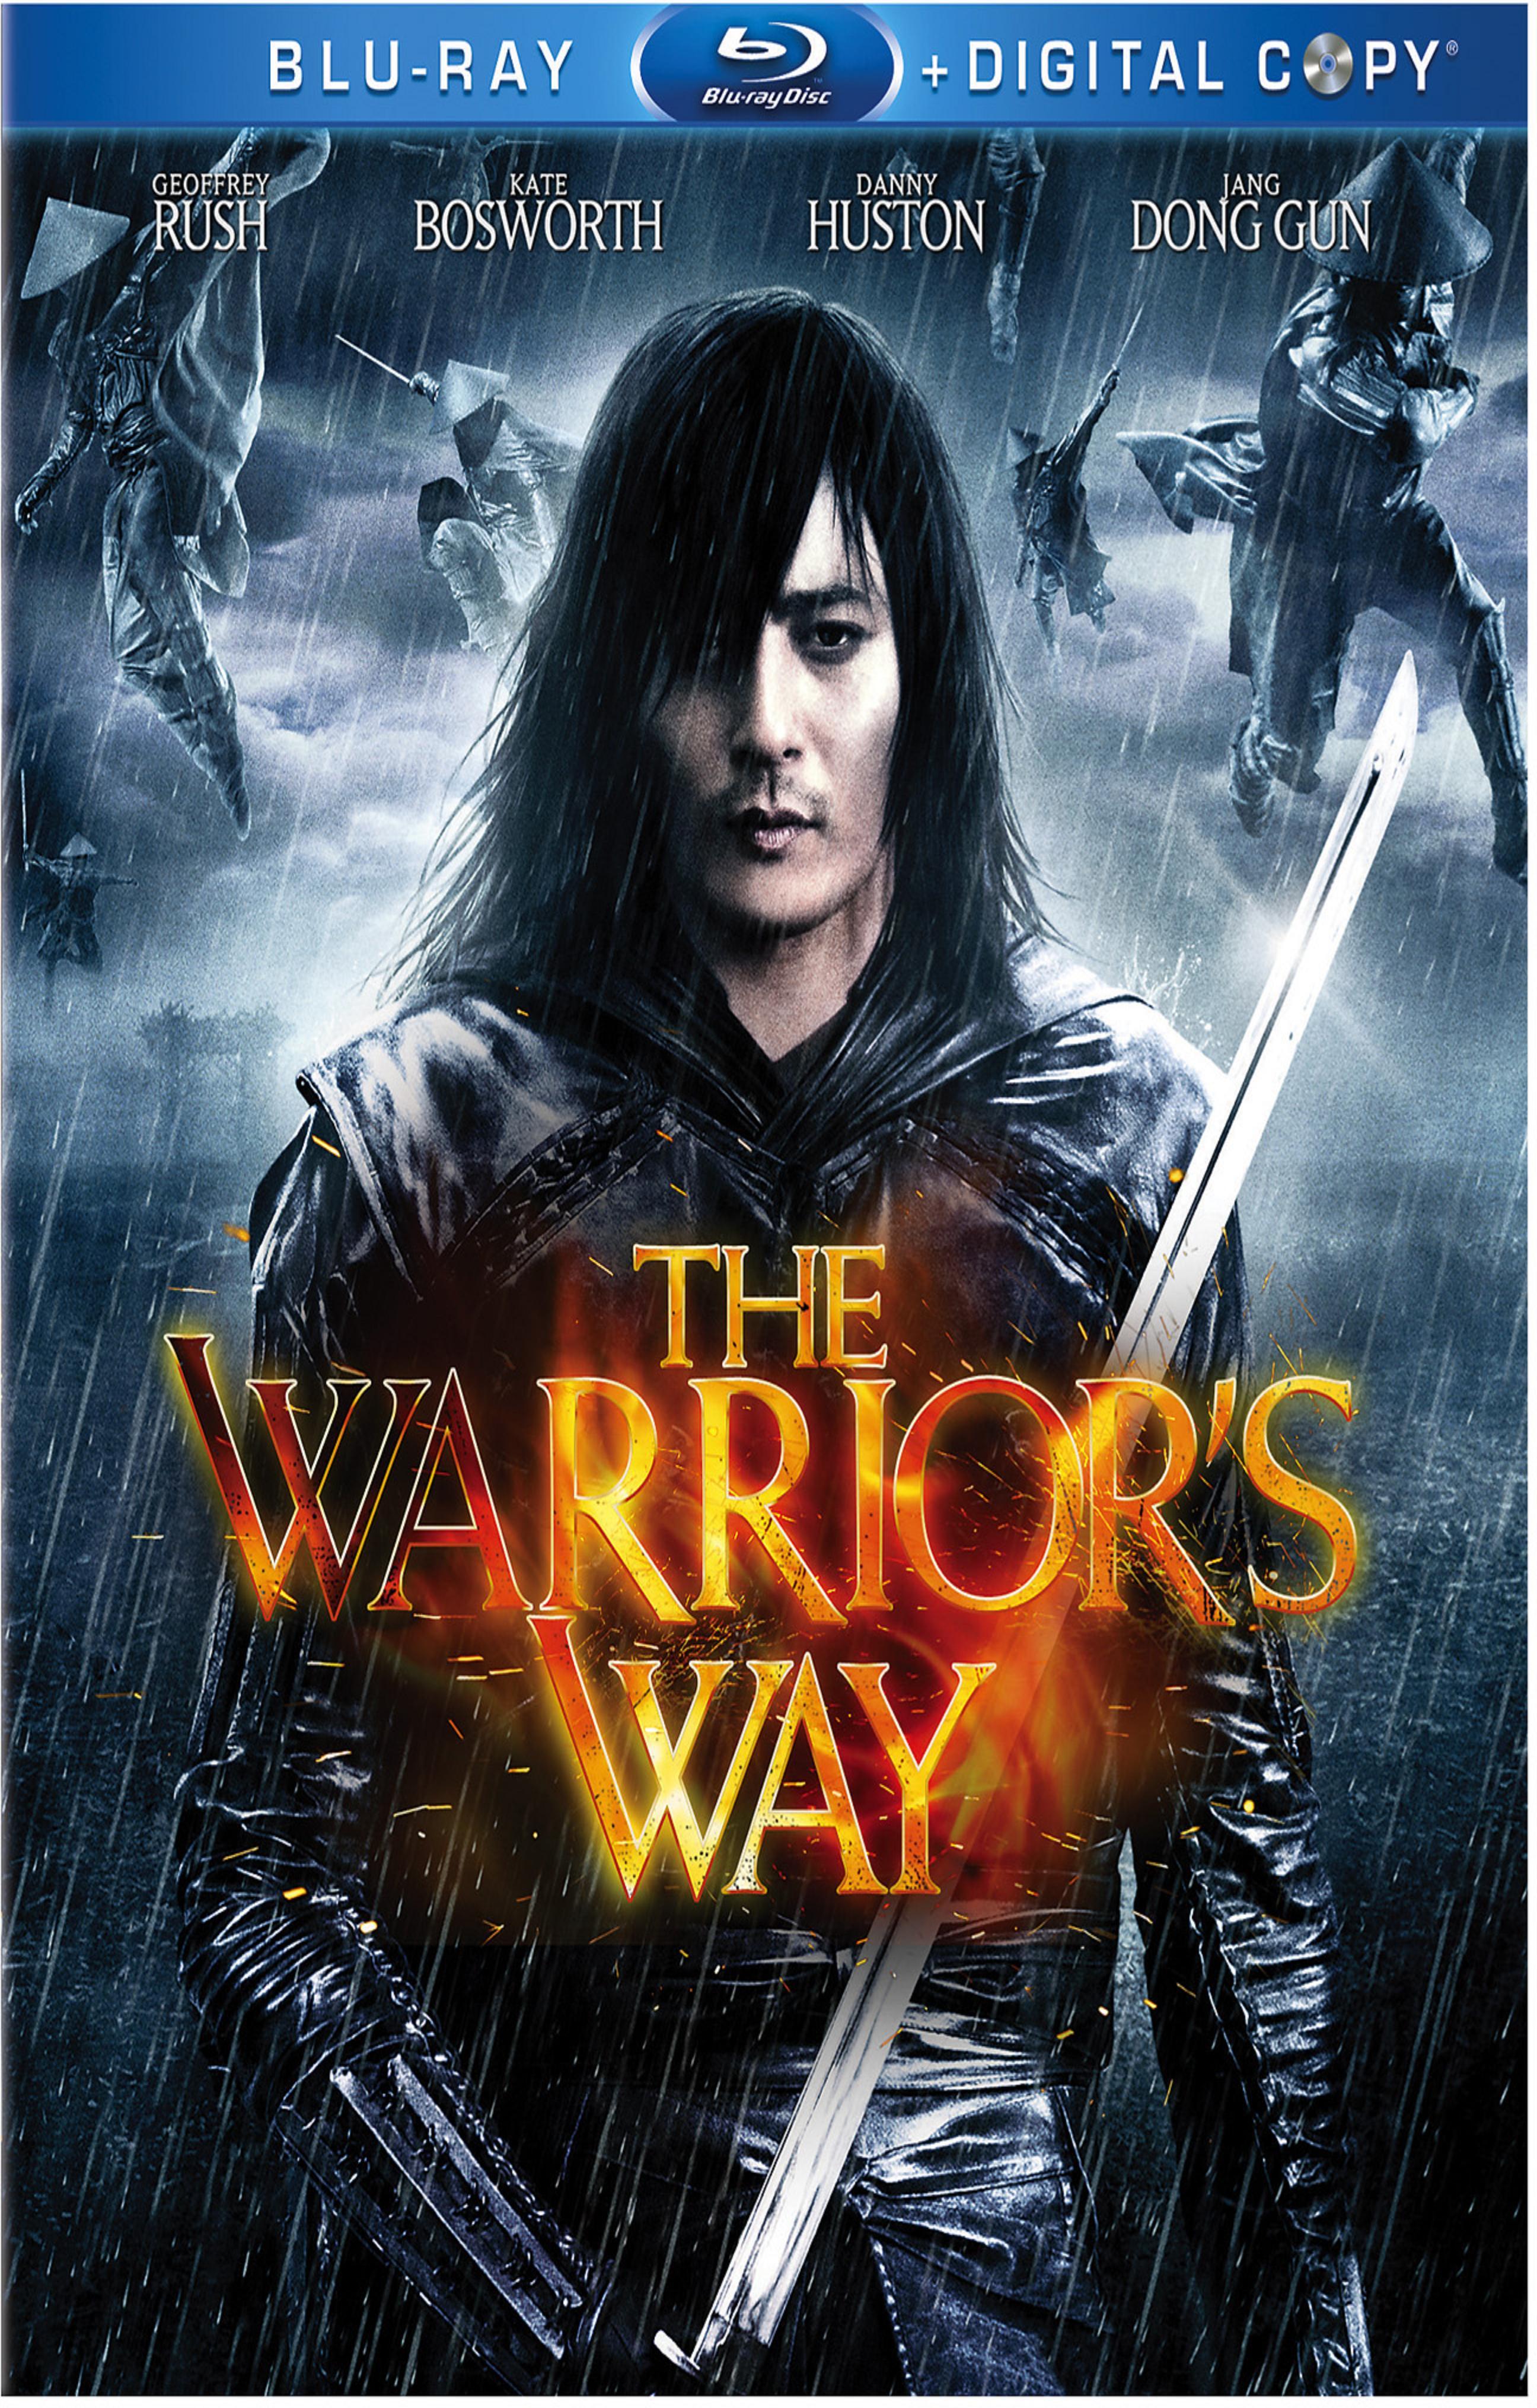 The Warriors Way มหาสงครามโคตรคนต่างพันธุ์ HD 2010